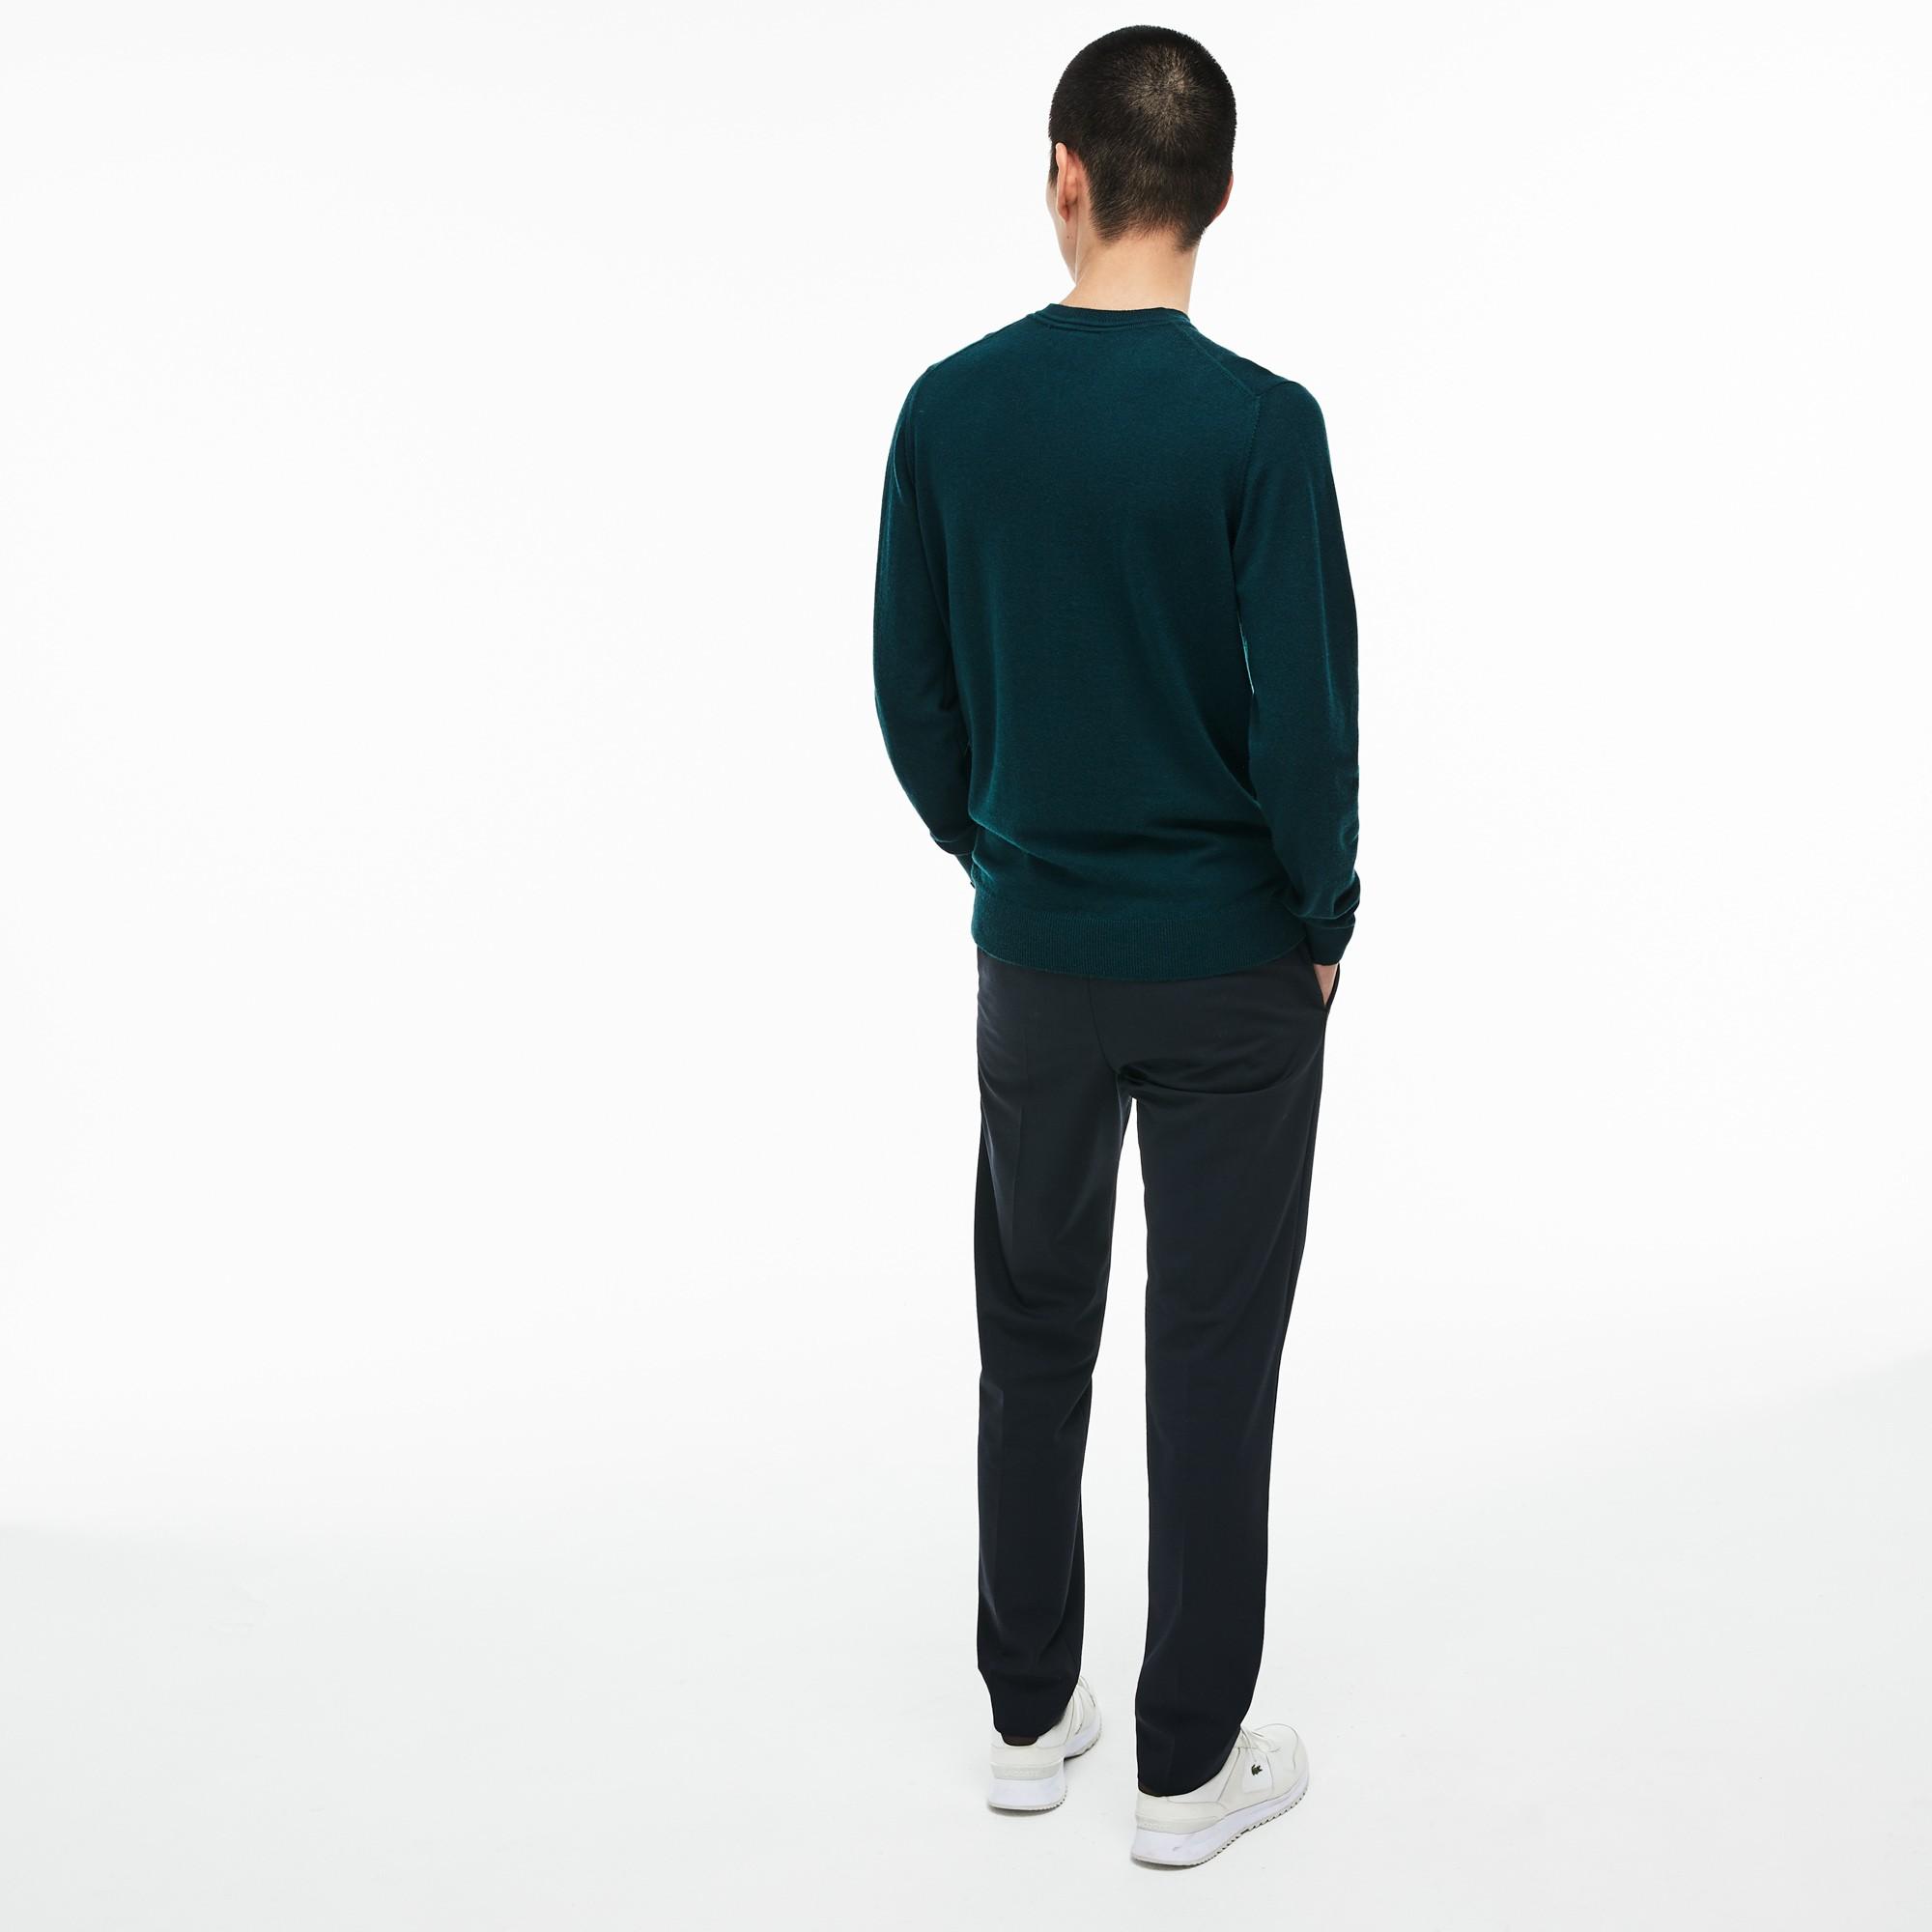 Фото 4 - Мужской свитер Lacoste зеленого цвета